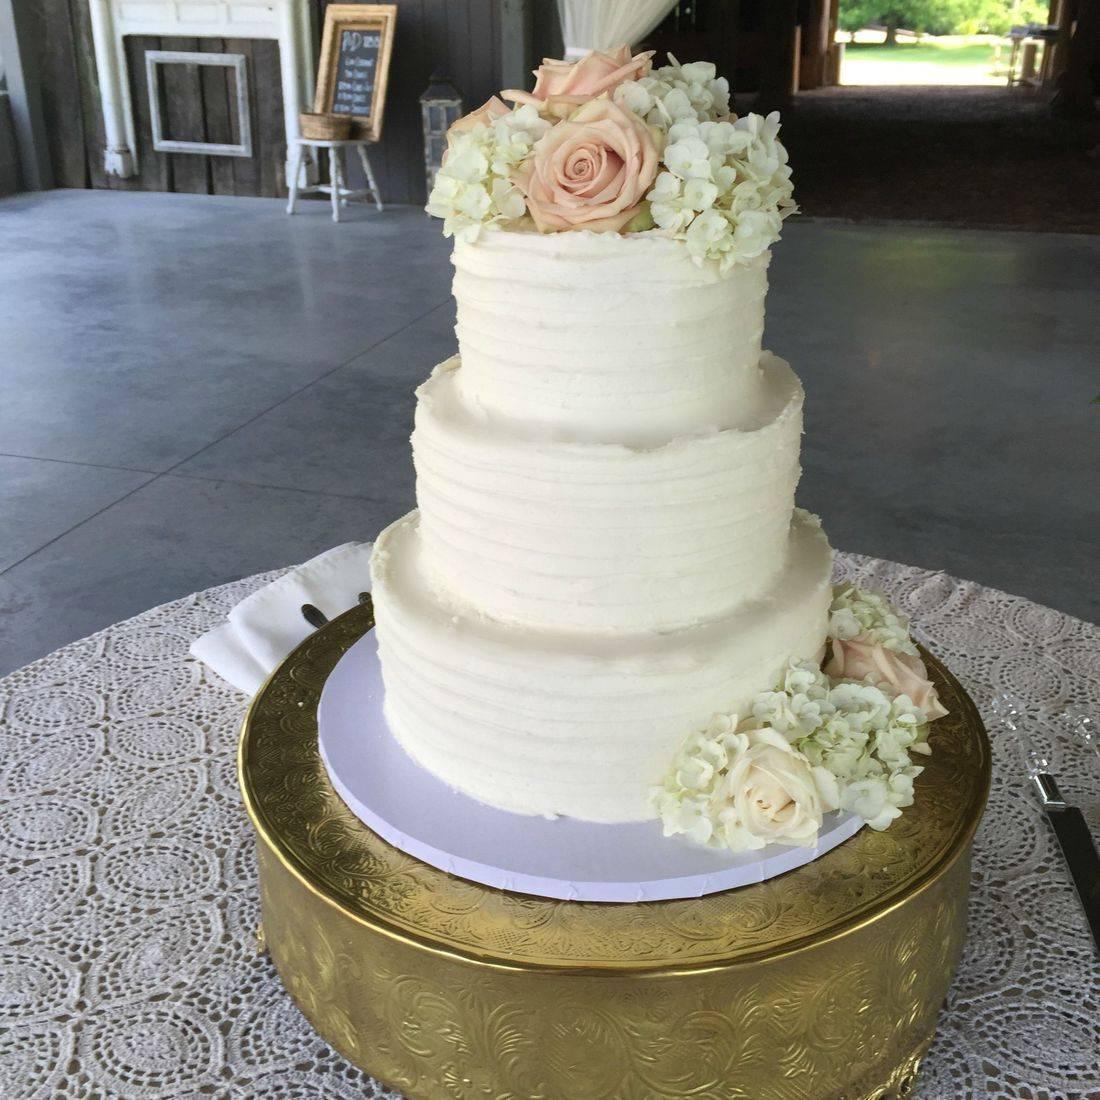 Buttercream Wedding Cake Tiffany Blue Lace southern Chic